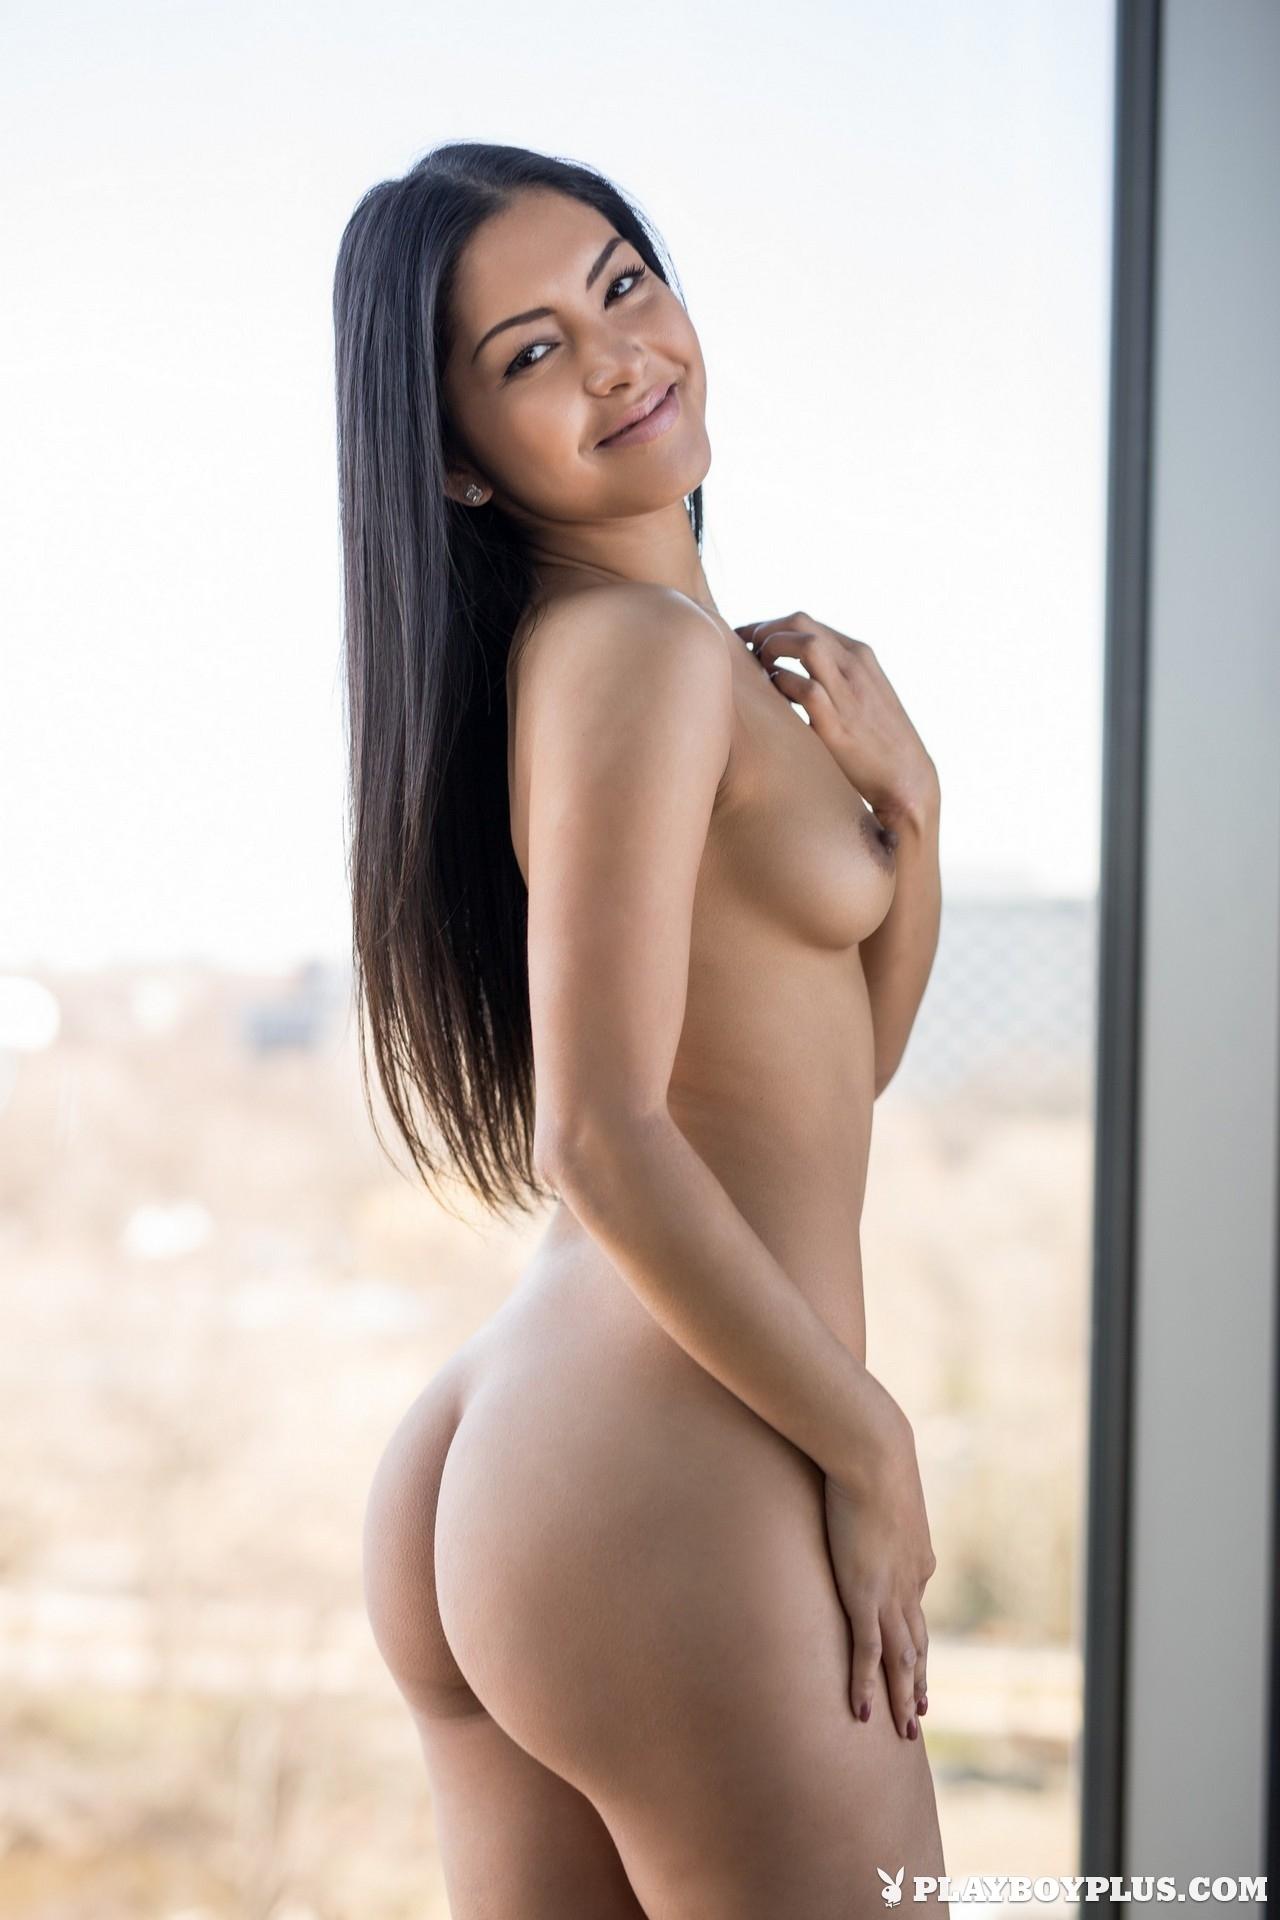 Playboy Plus Chloe Rose In Inspiring View (25)